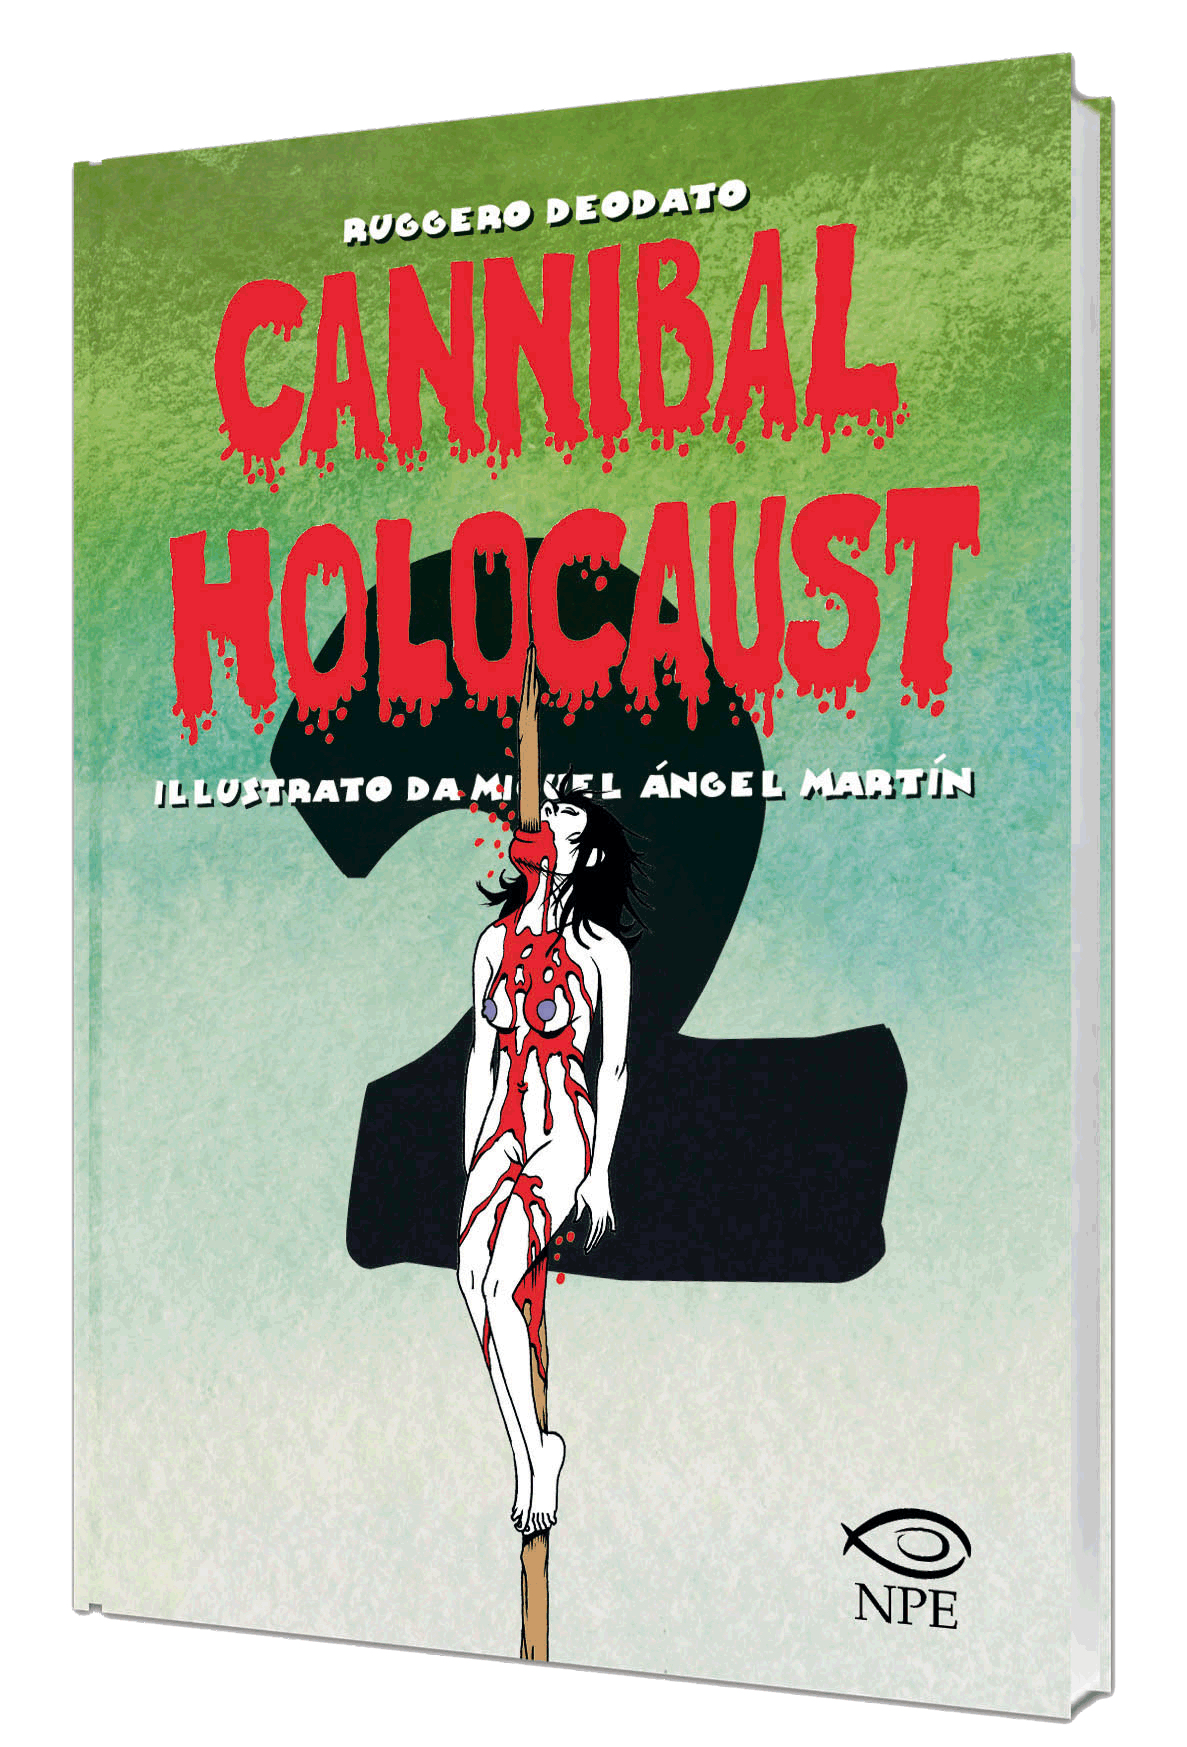 Cannibal Holocaust di Miguel Angel Martin